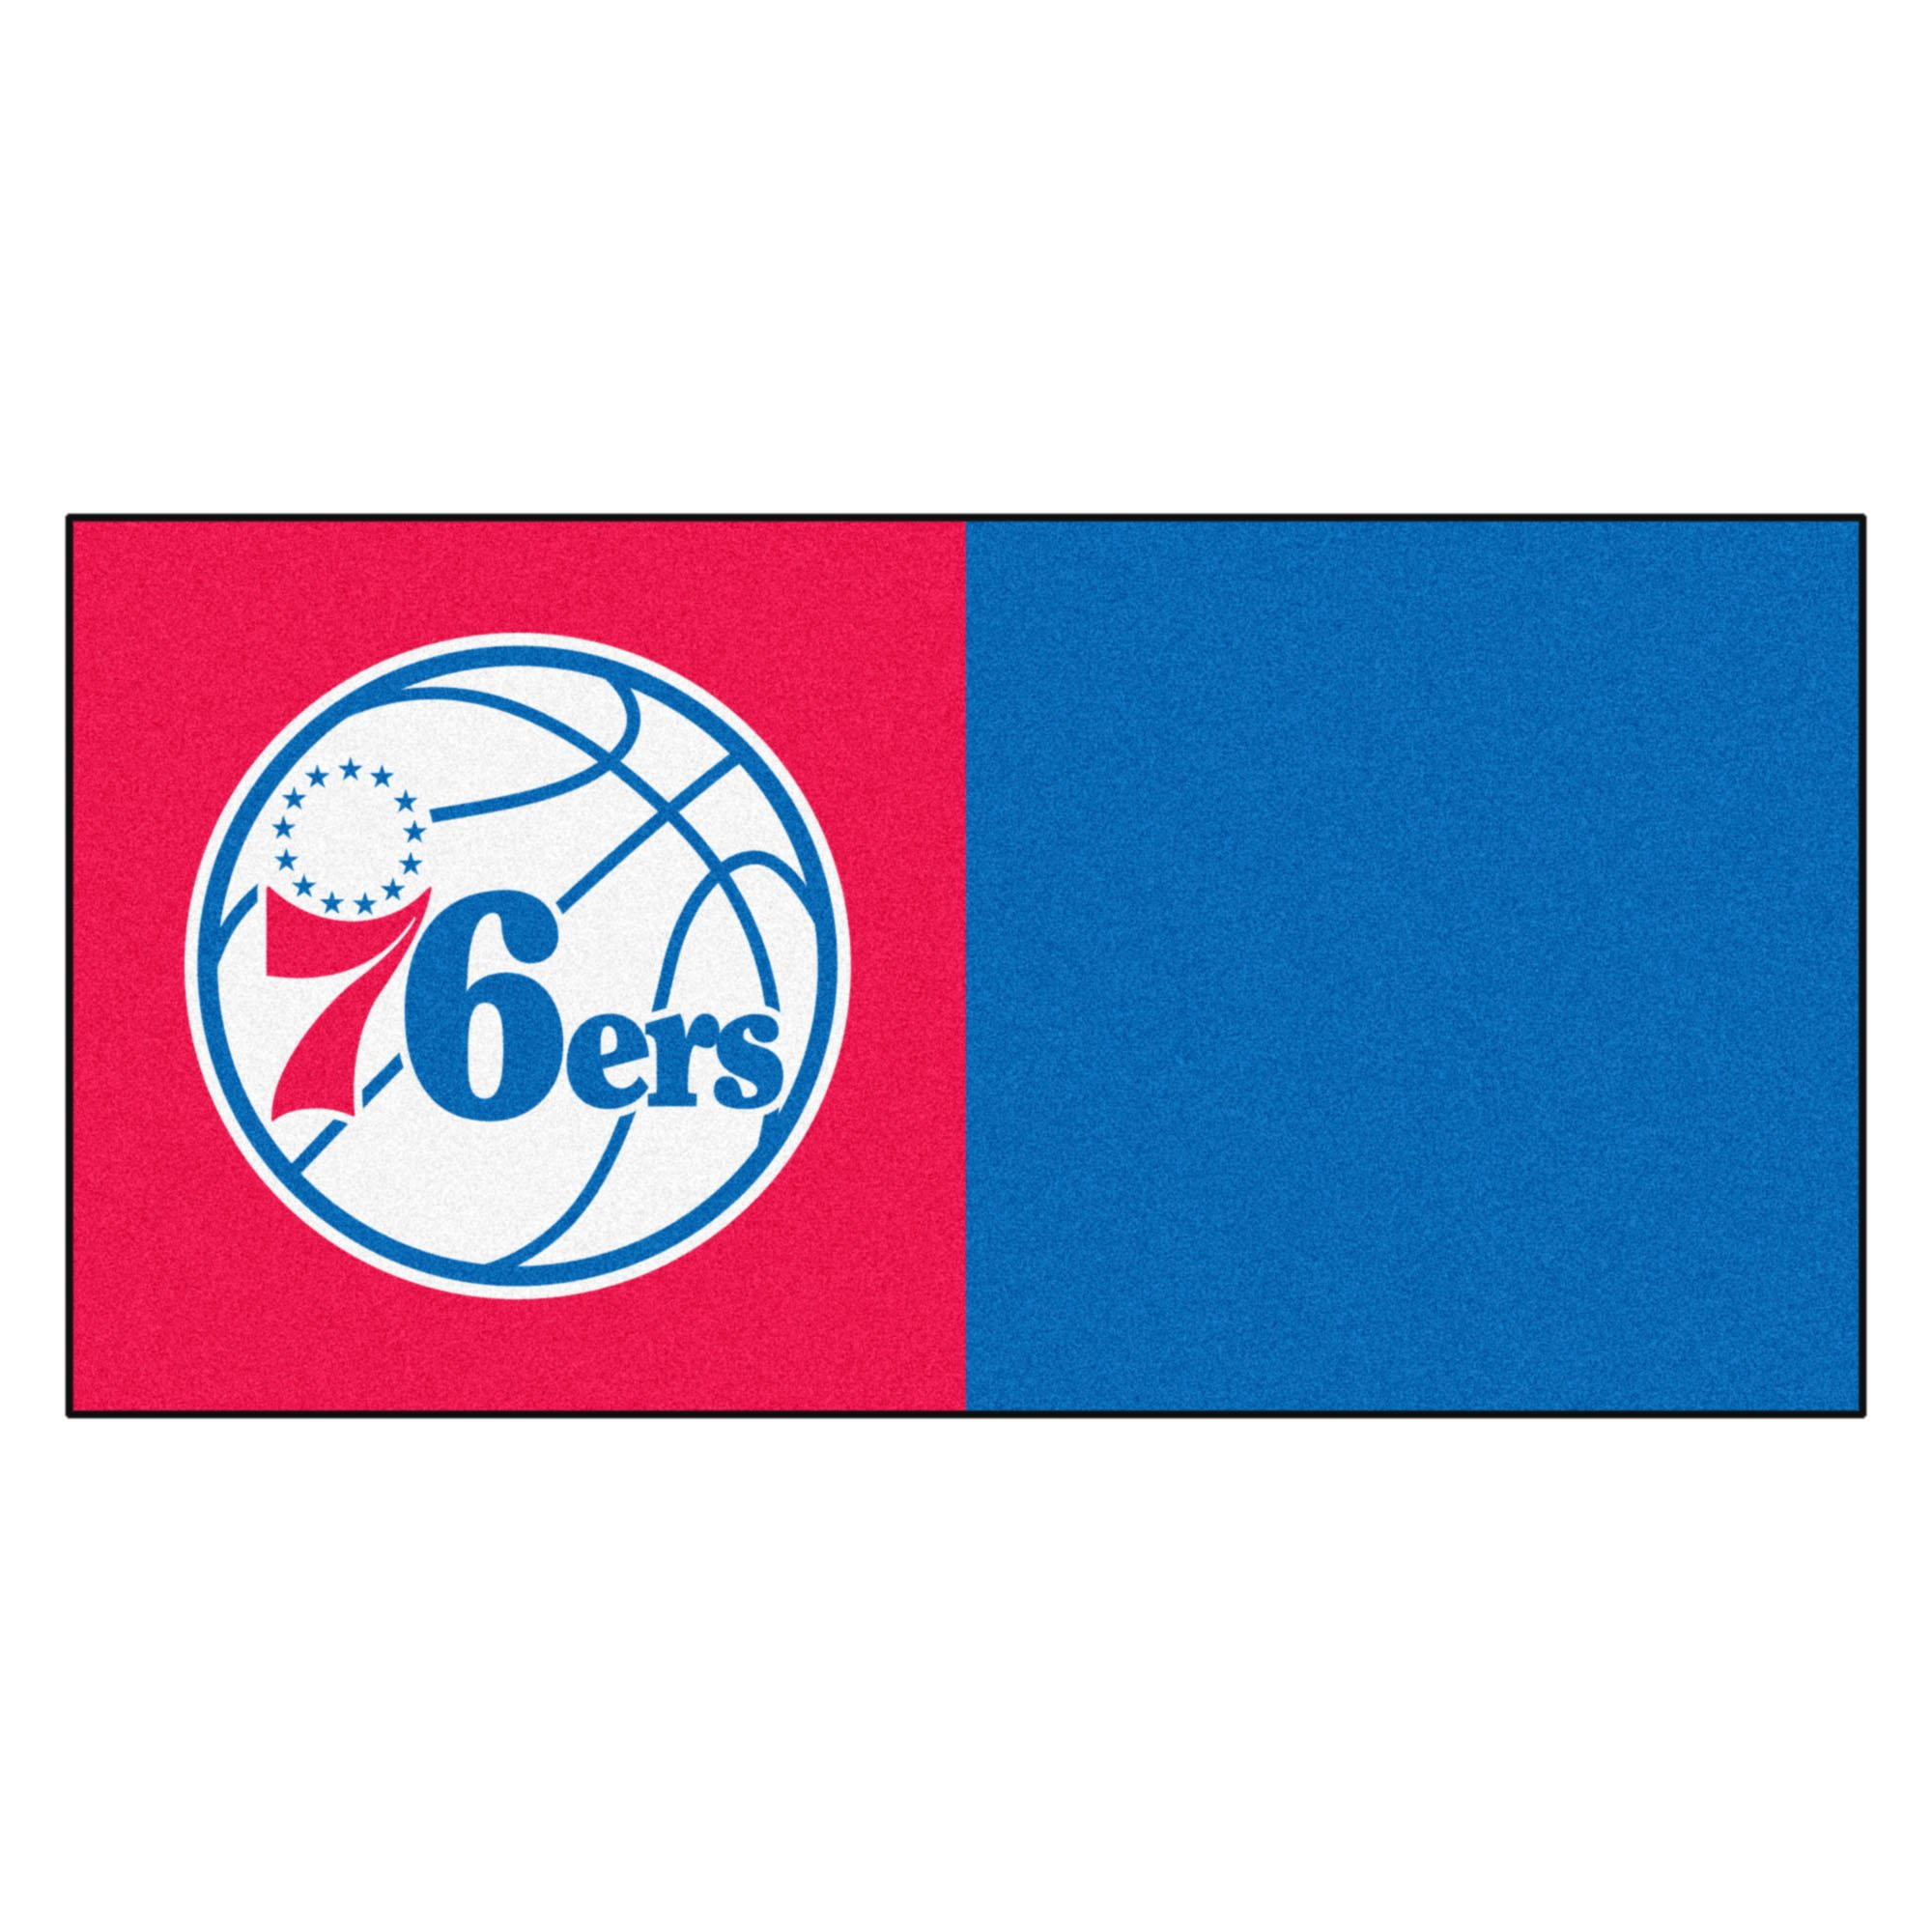 FANMATS NBA Philadelphia 76ers Nylon Face Team Carpet Tiles by Fanmats